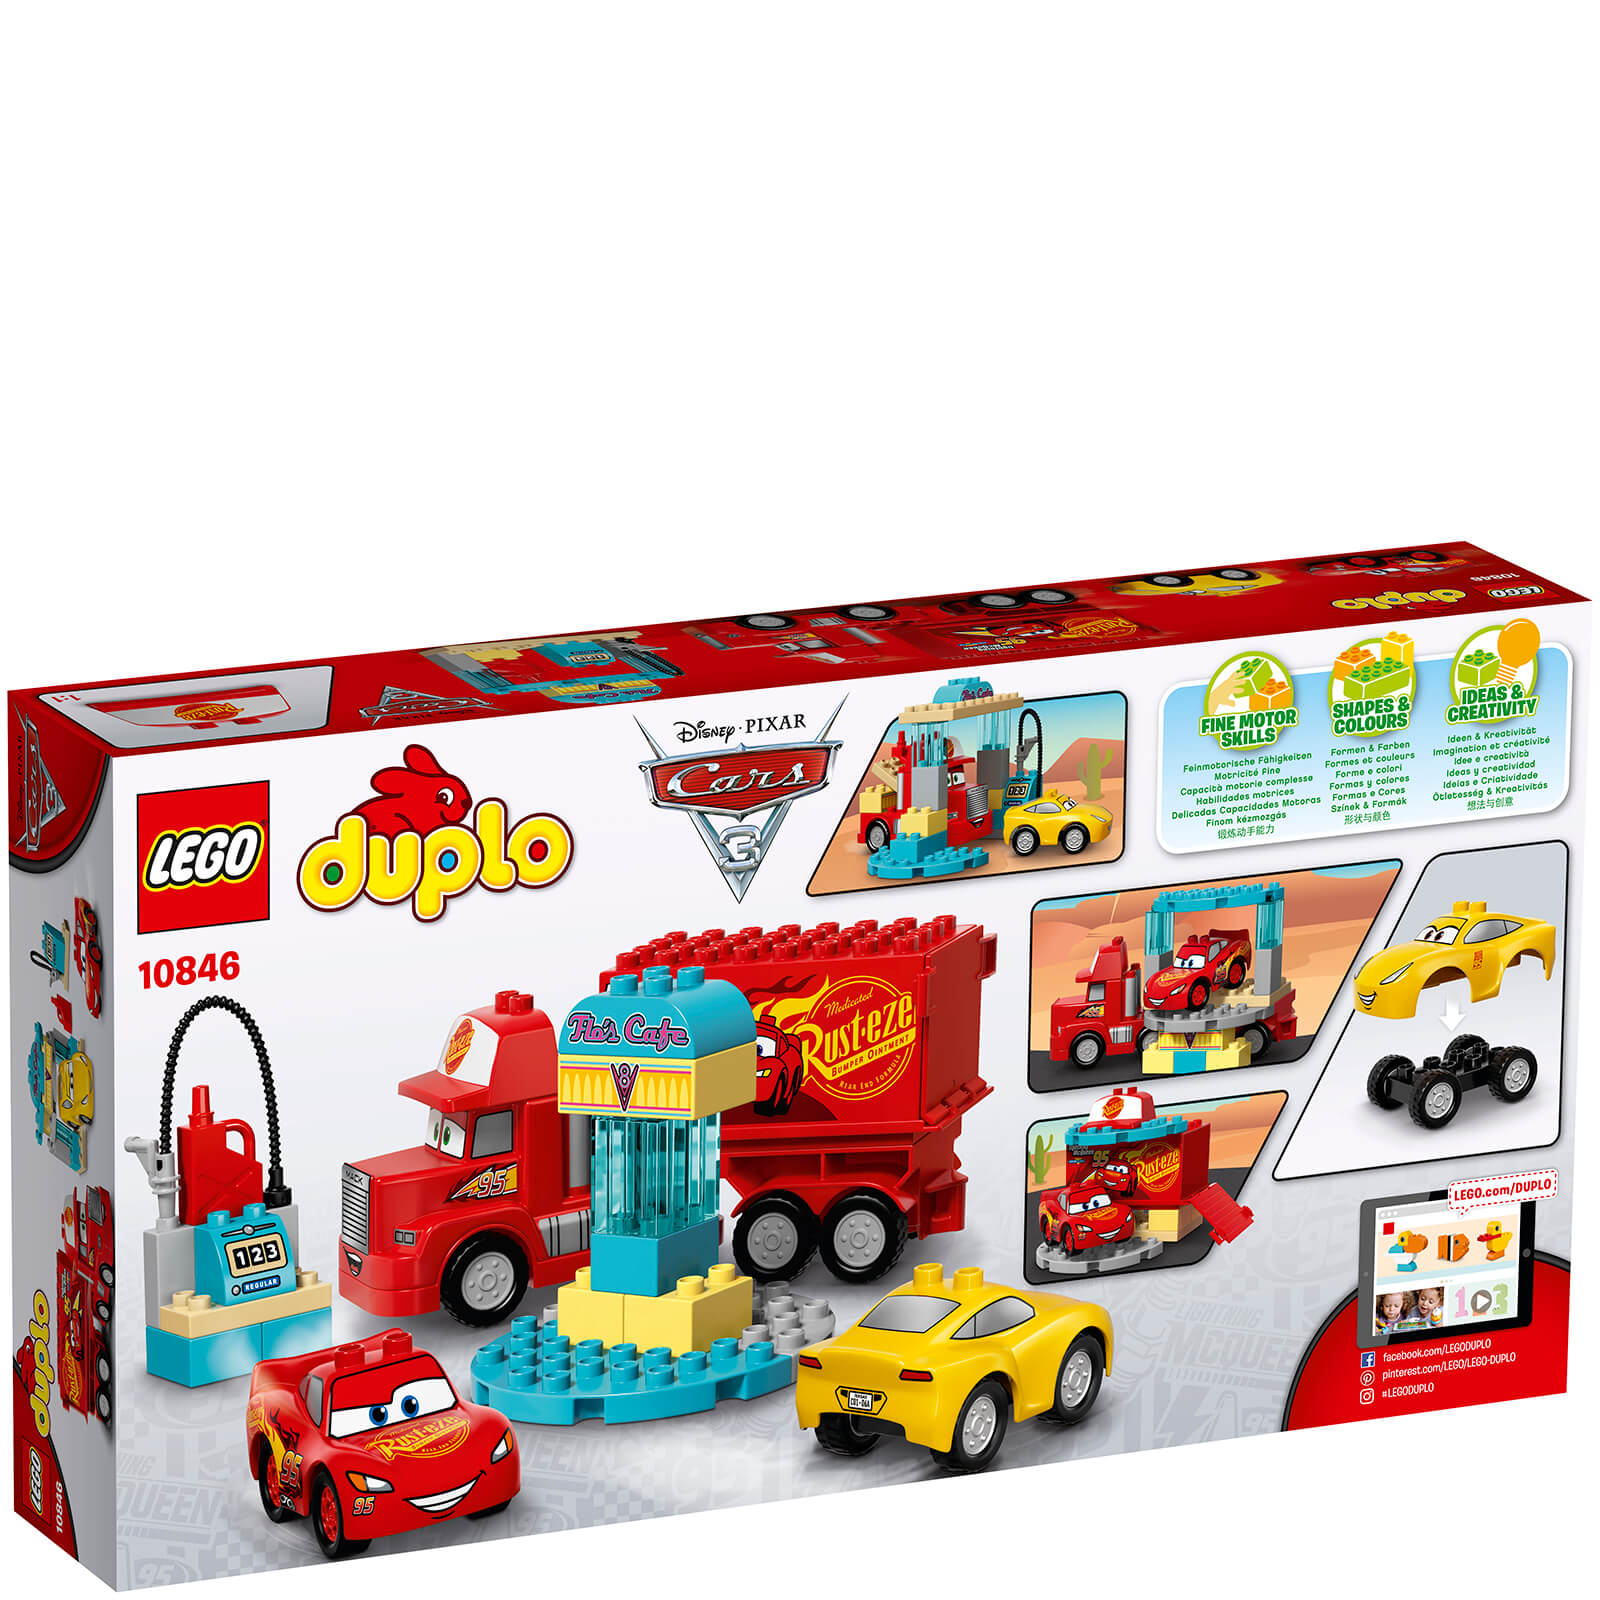 Lego Duplo Cars 3 Flos Café 10846 Toys Zavvi